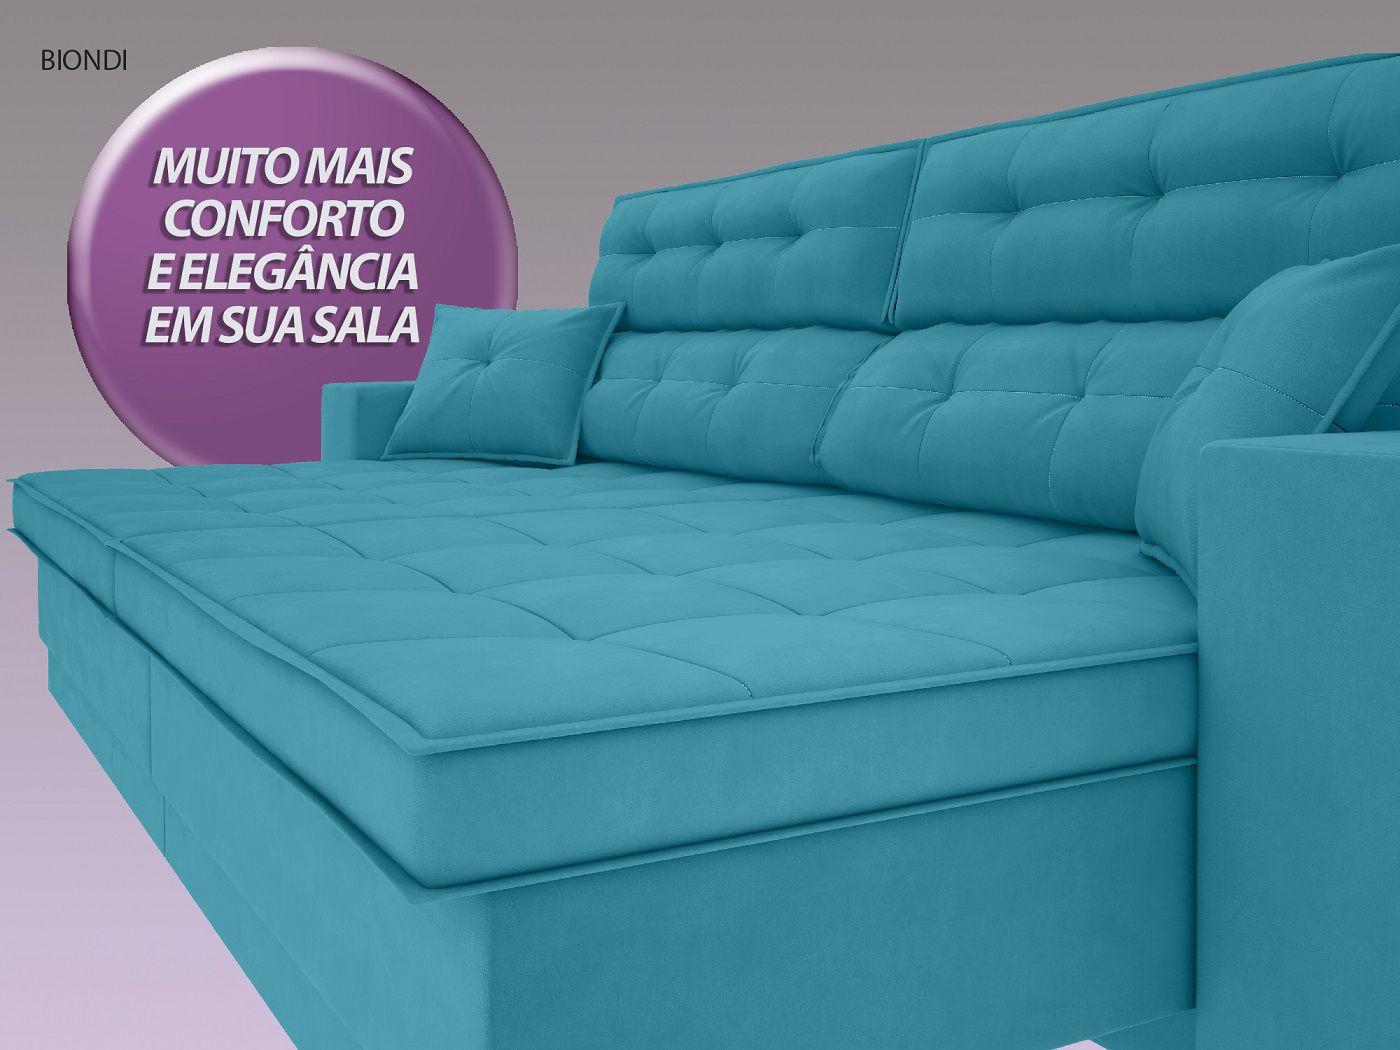 Sofá New Biondi 2,10m Retrátil e Reclinável Velosuede Turquesa  - NETSOFAS